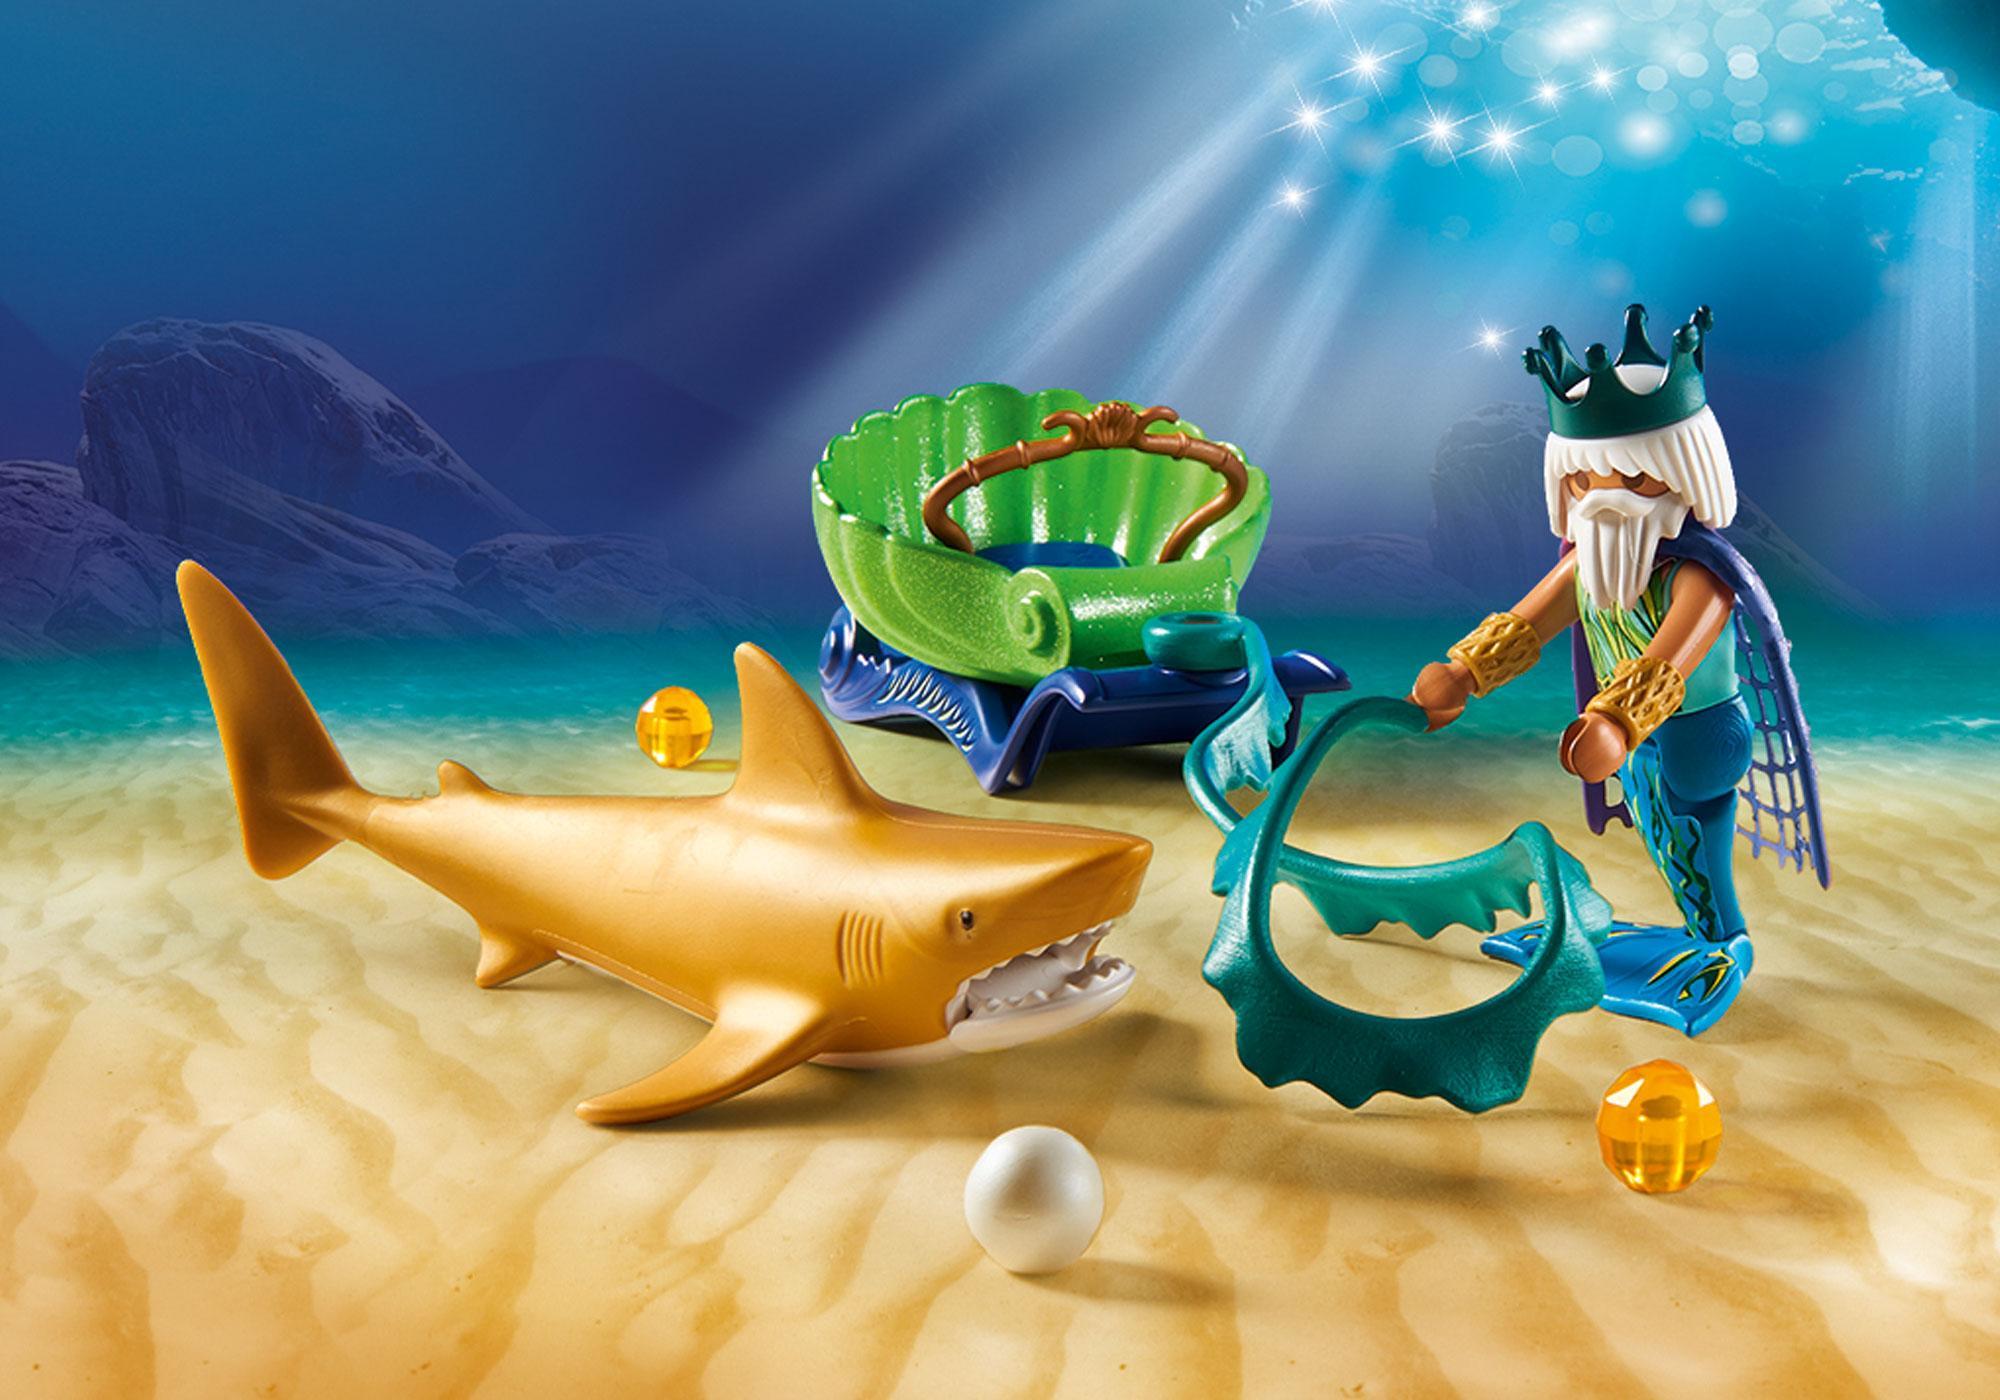 http://media.playmobil.com/i/playmobil/70097_product_extra1/Re dei mari con carrozza e squalo